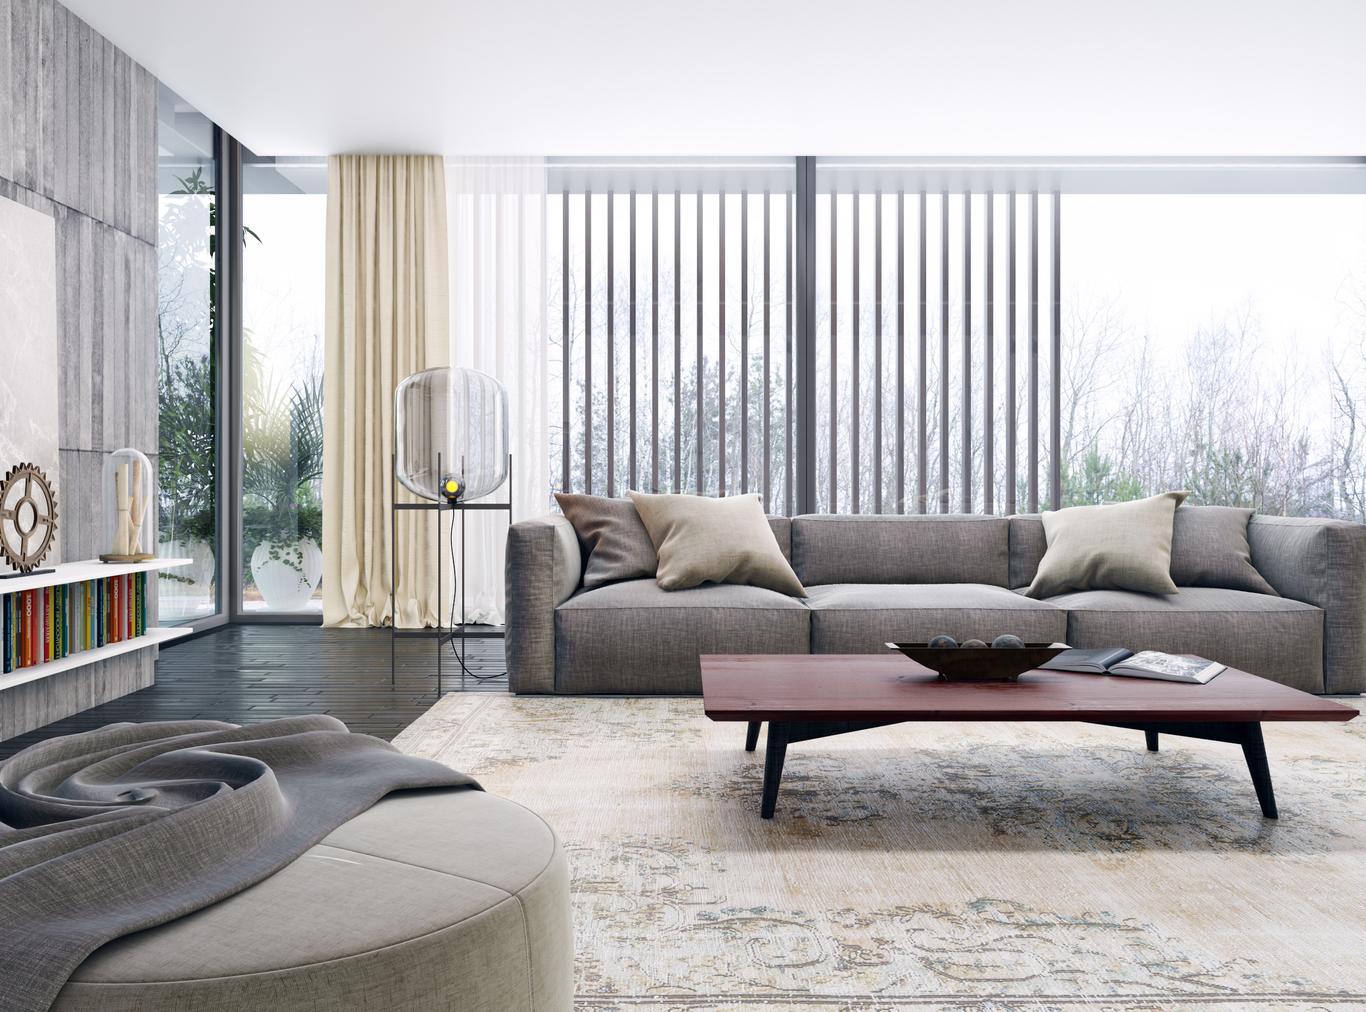 Diex livingroom 1 71b9d7c0 9yz0